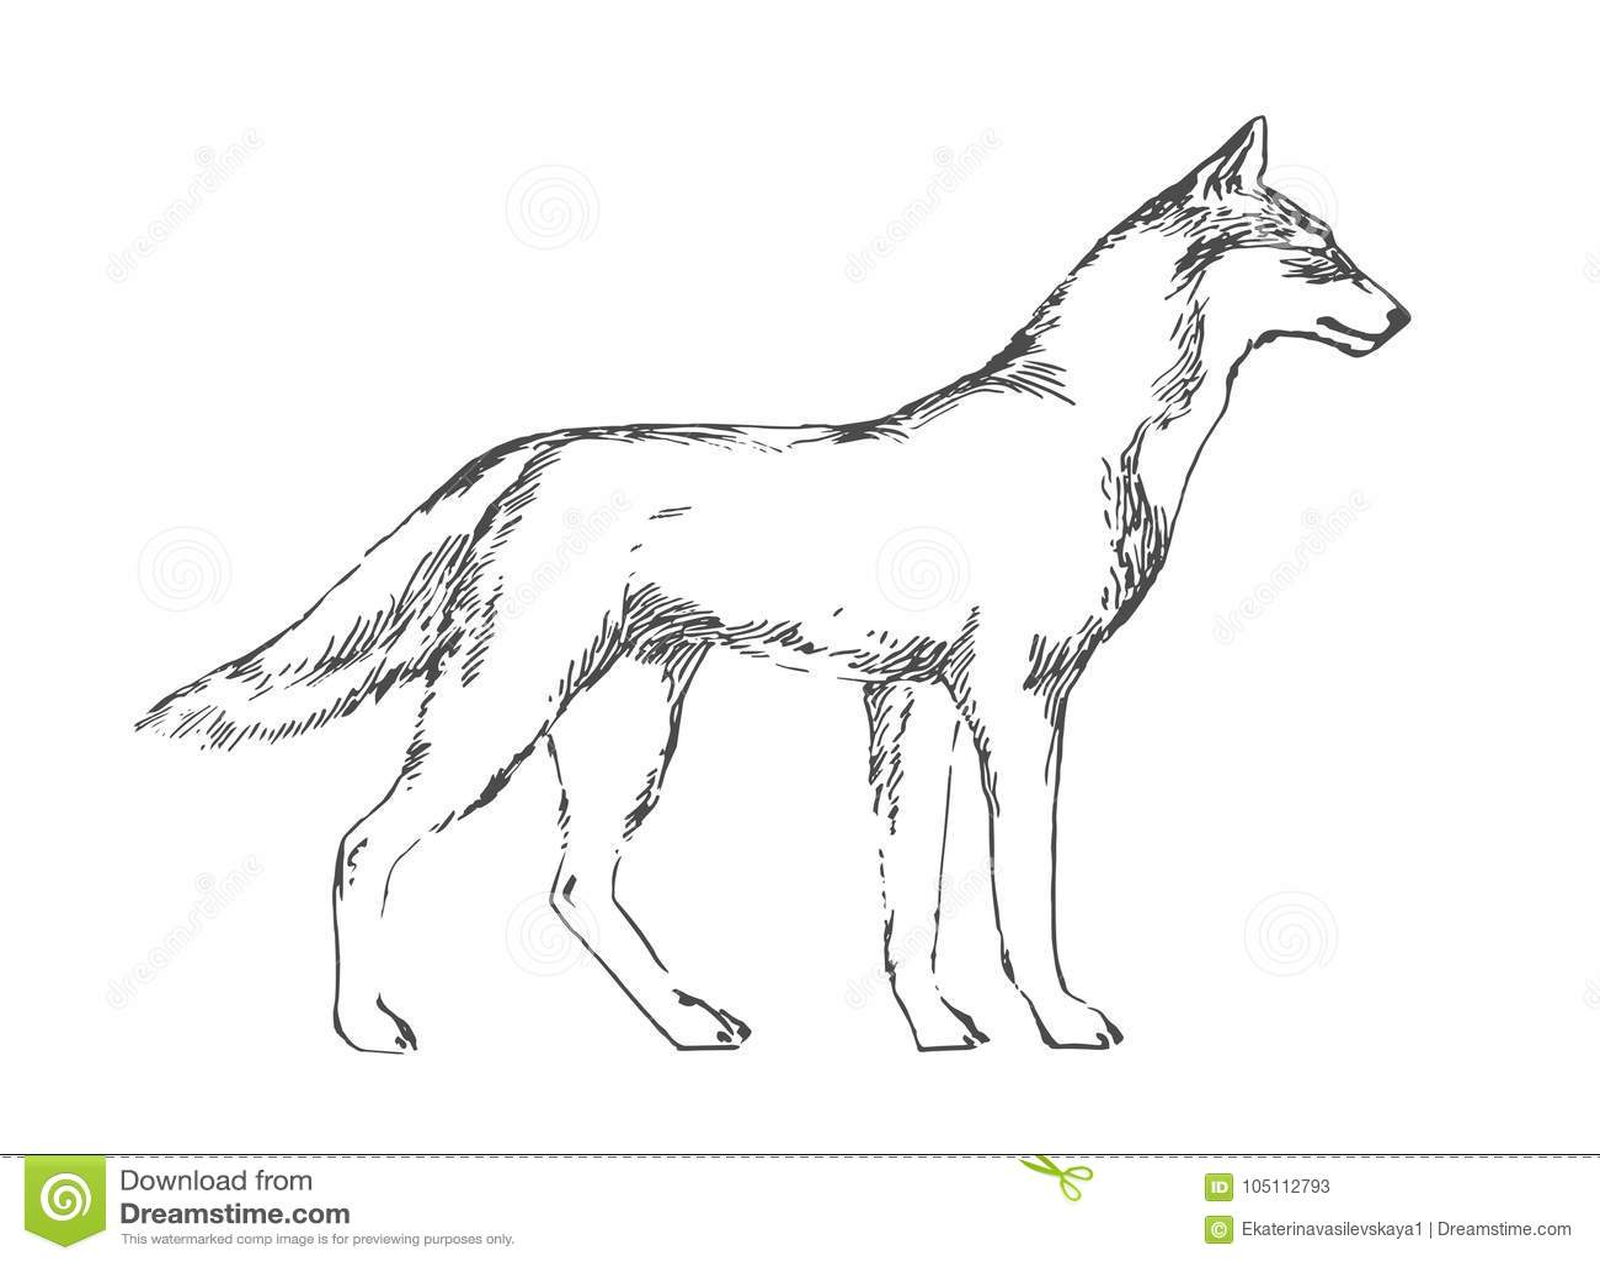 Hand drawn wolf black vector forest predator image on white background sketch style illustration